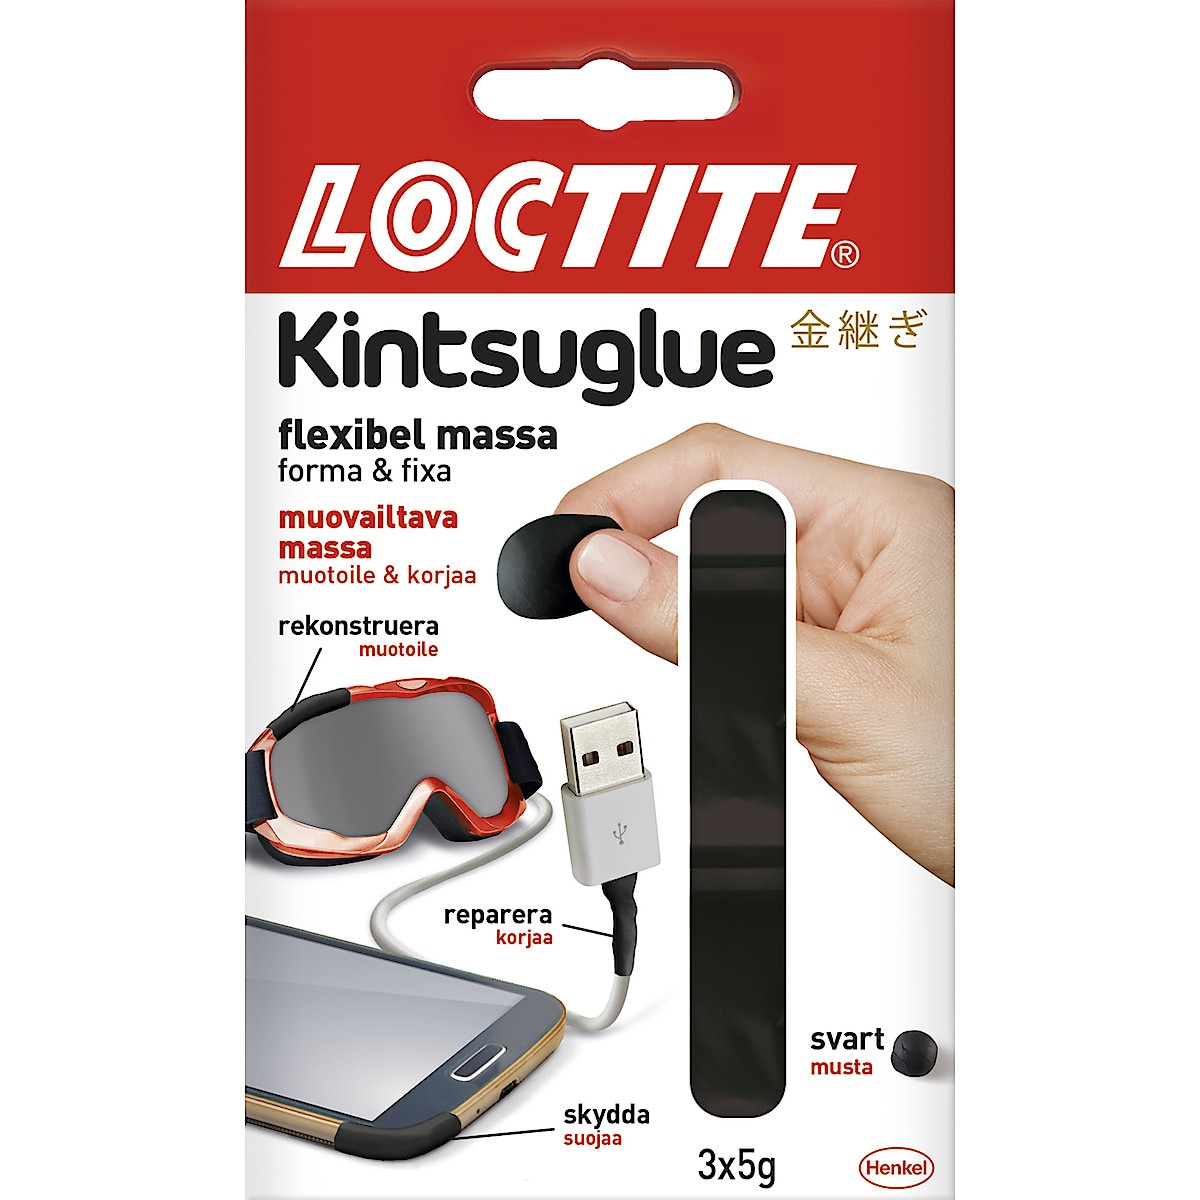 Reparationsmassa Loctite Kintsuglue | Clas Ohlson